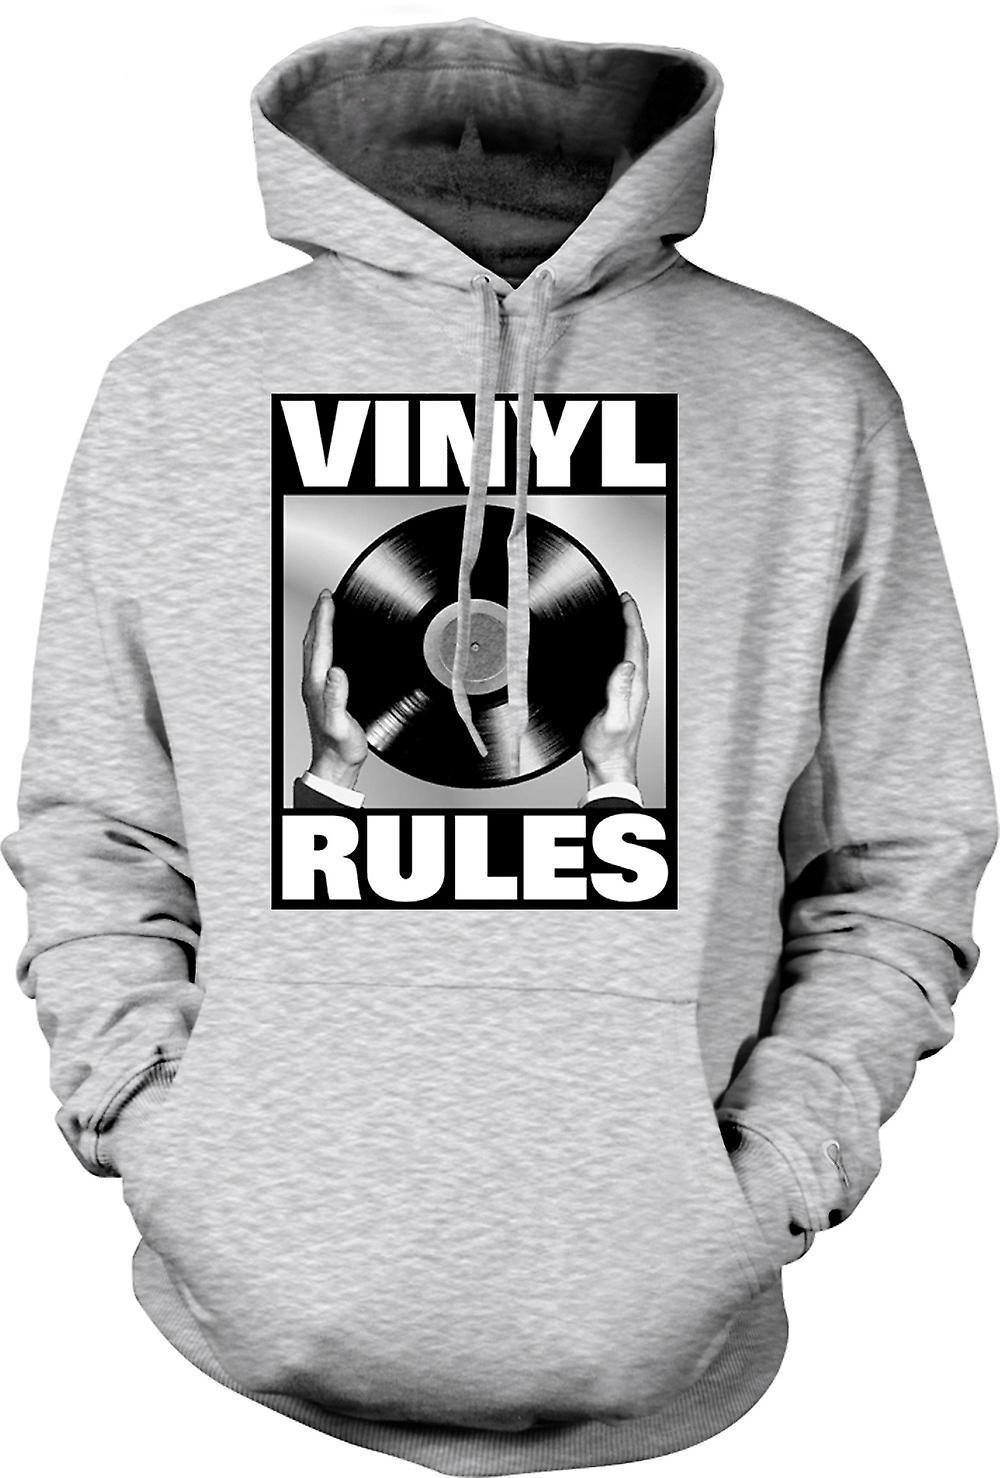 Mens Hoodie - Vinyl Rules - DJ mixen